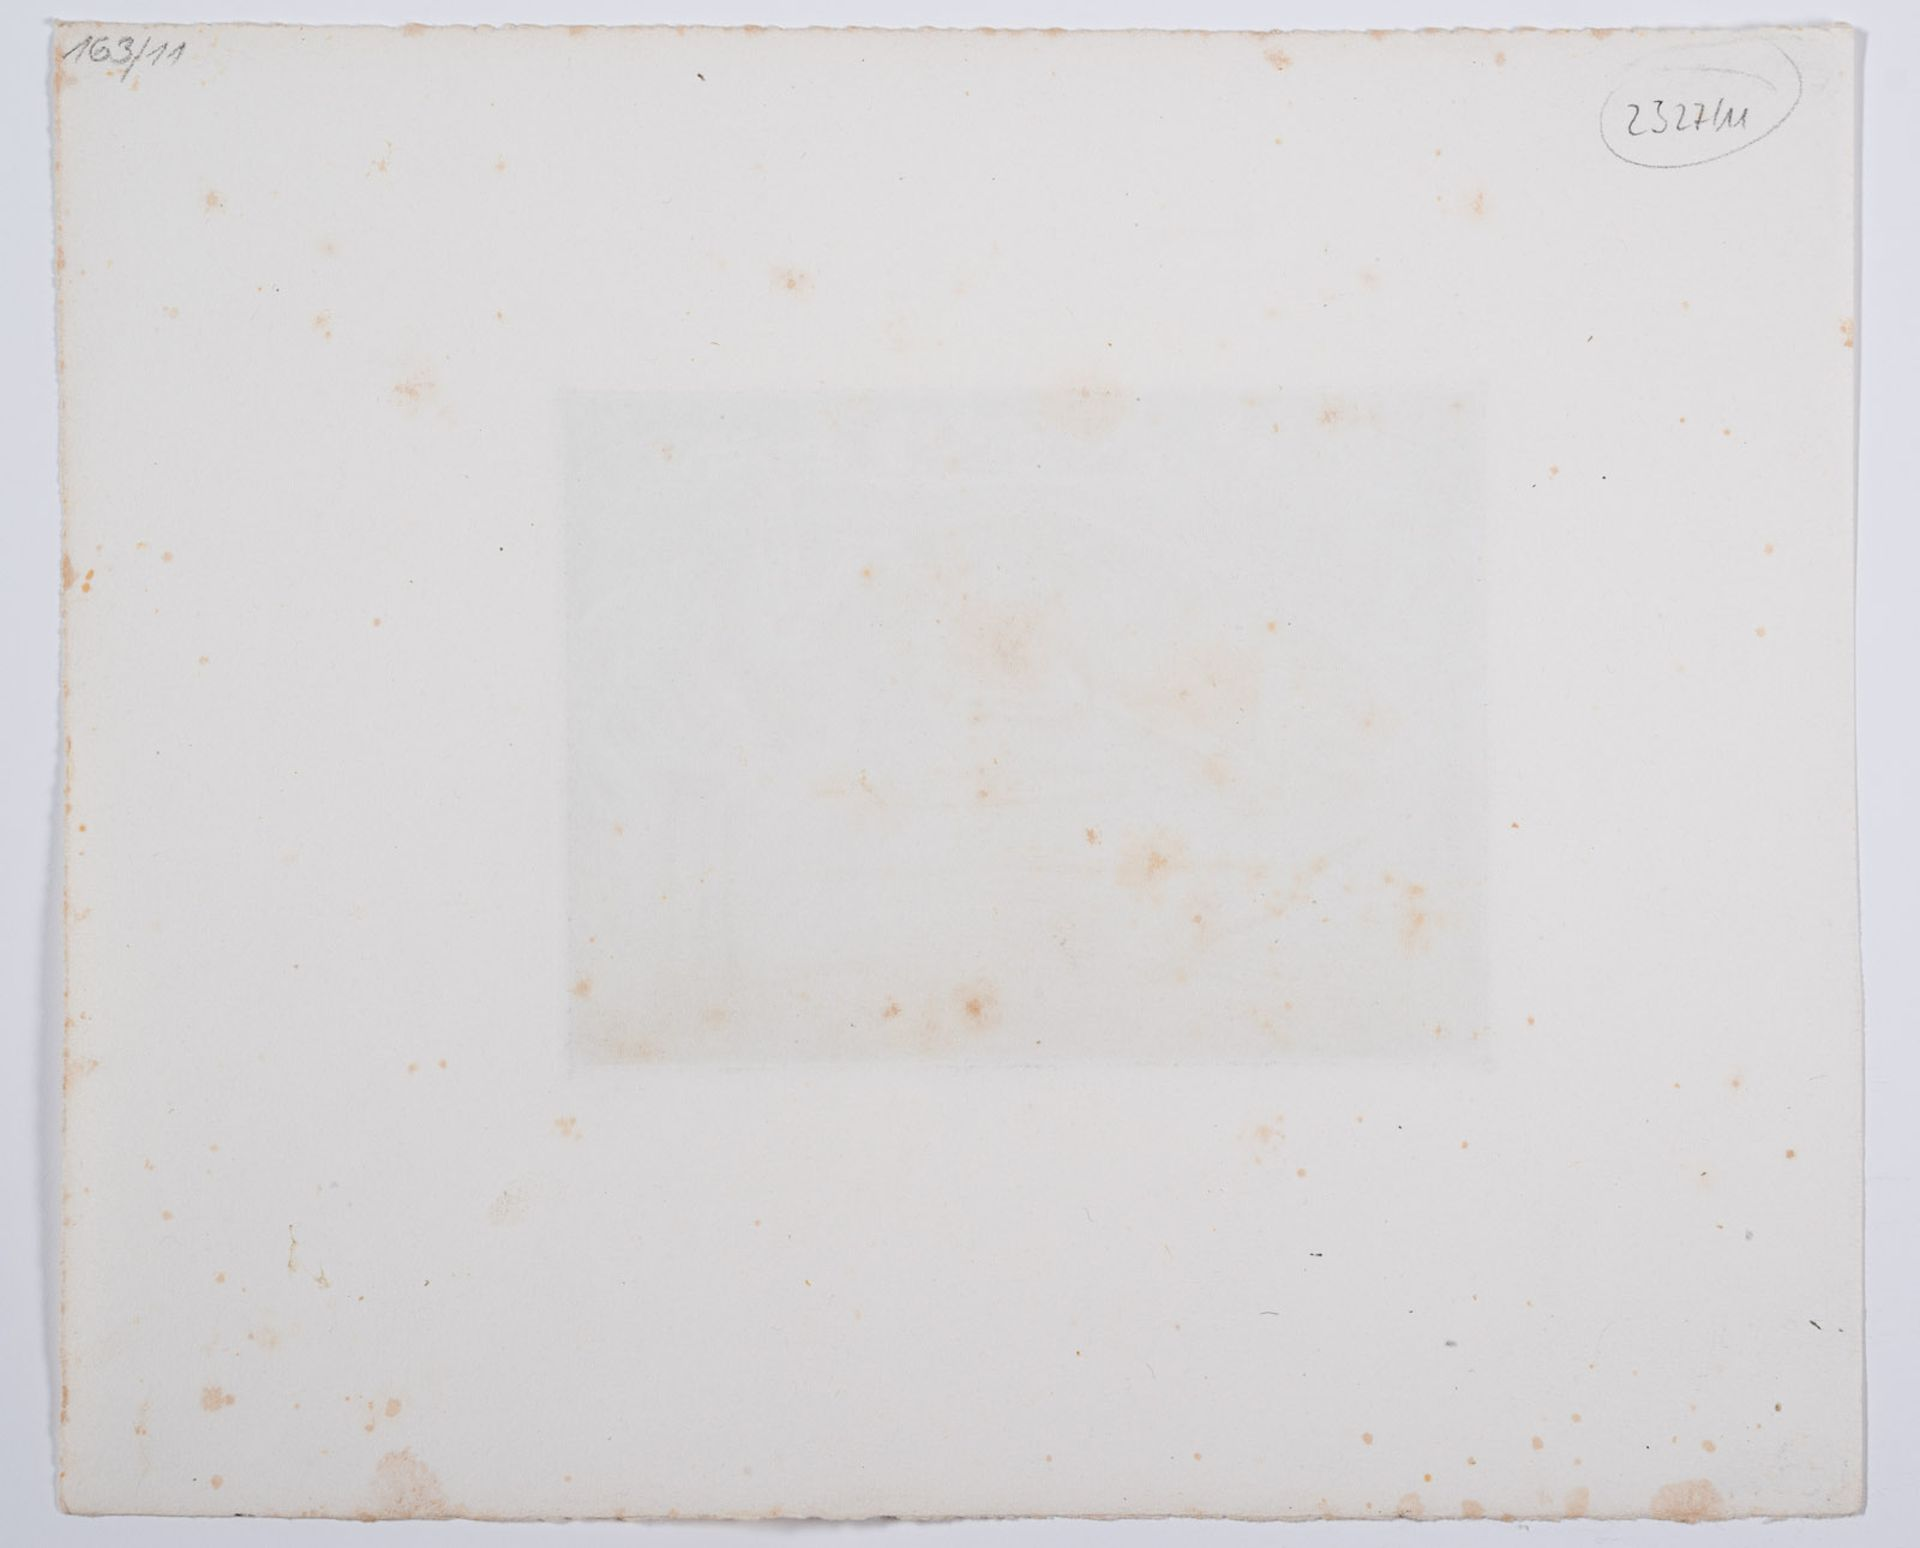 Geiger, Willi - Image 14 of 22